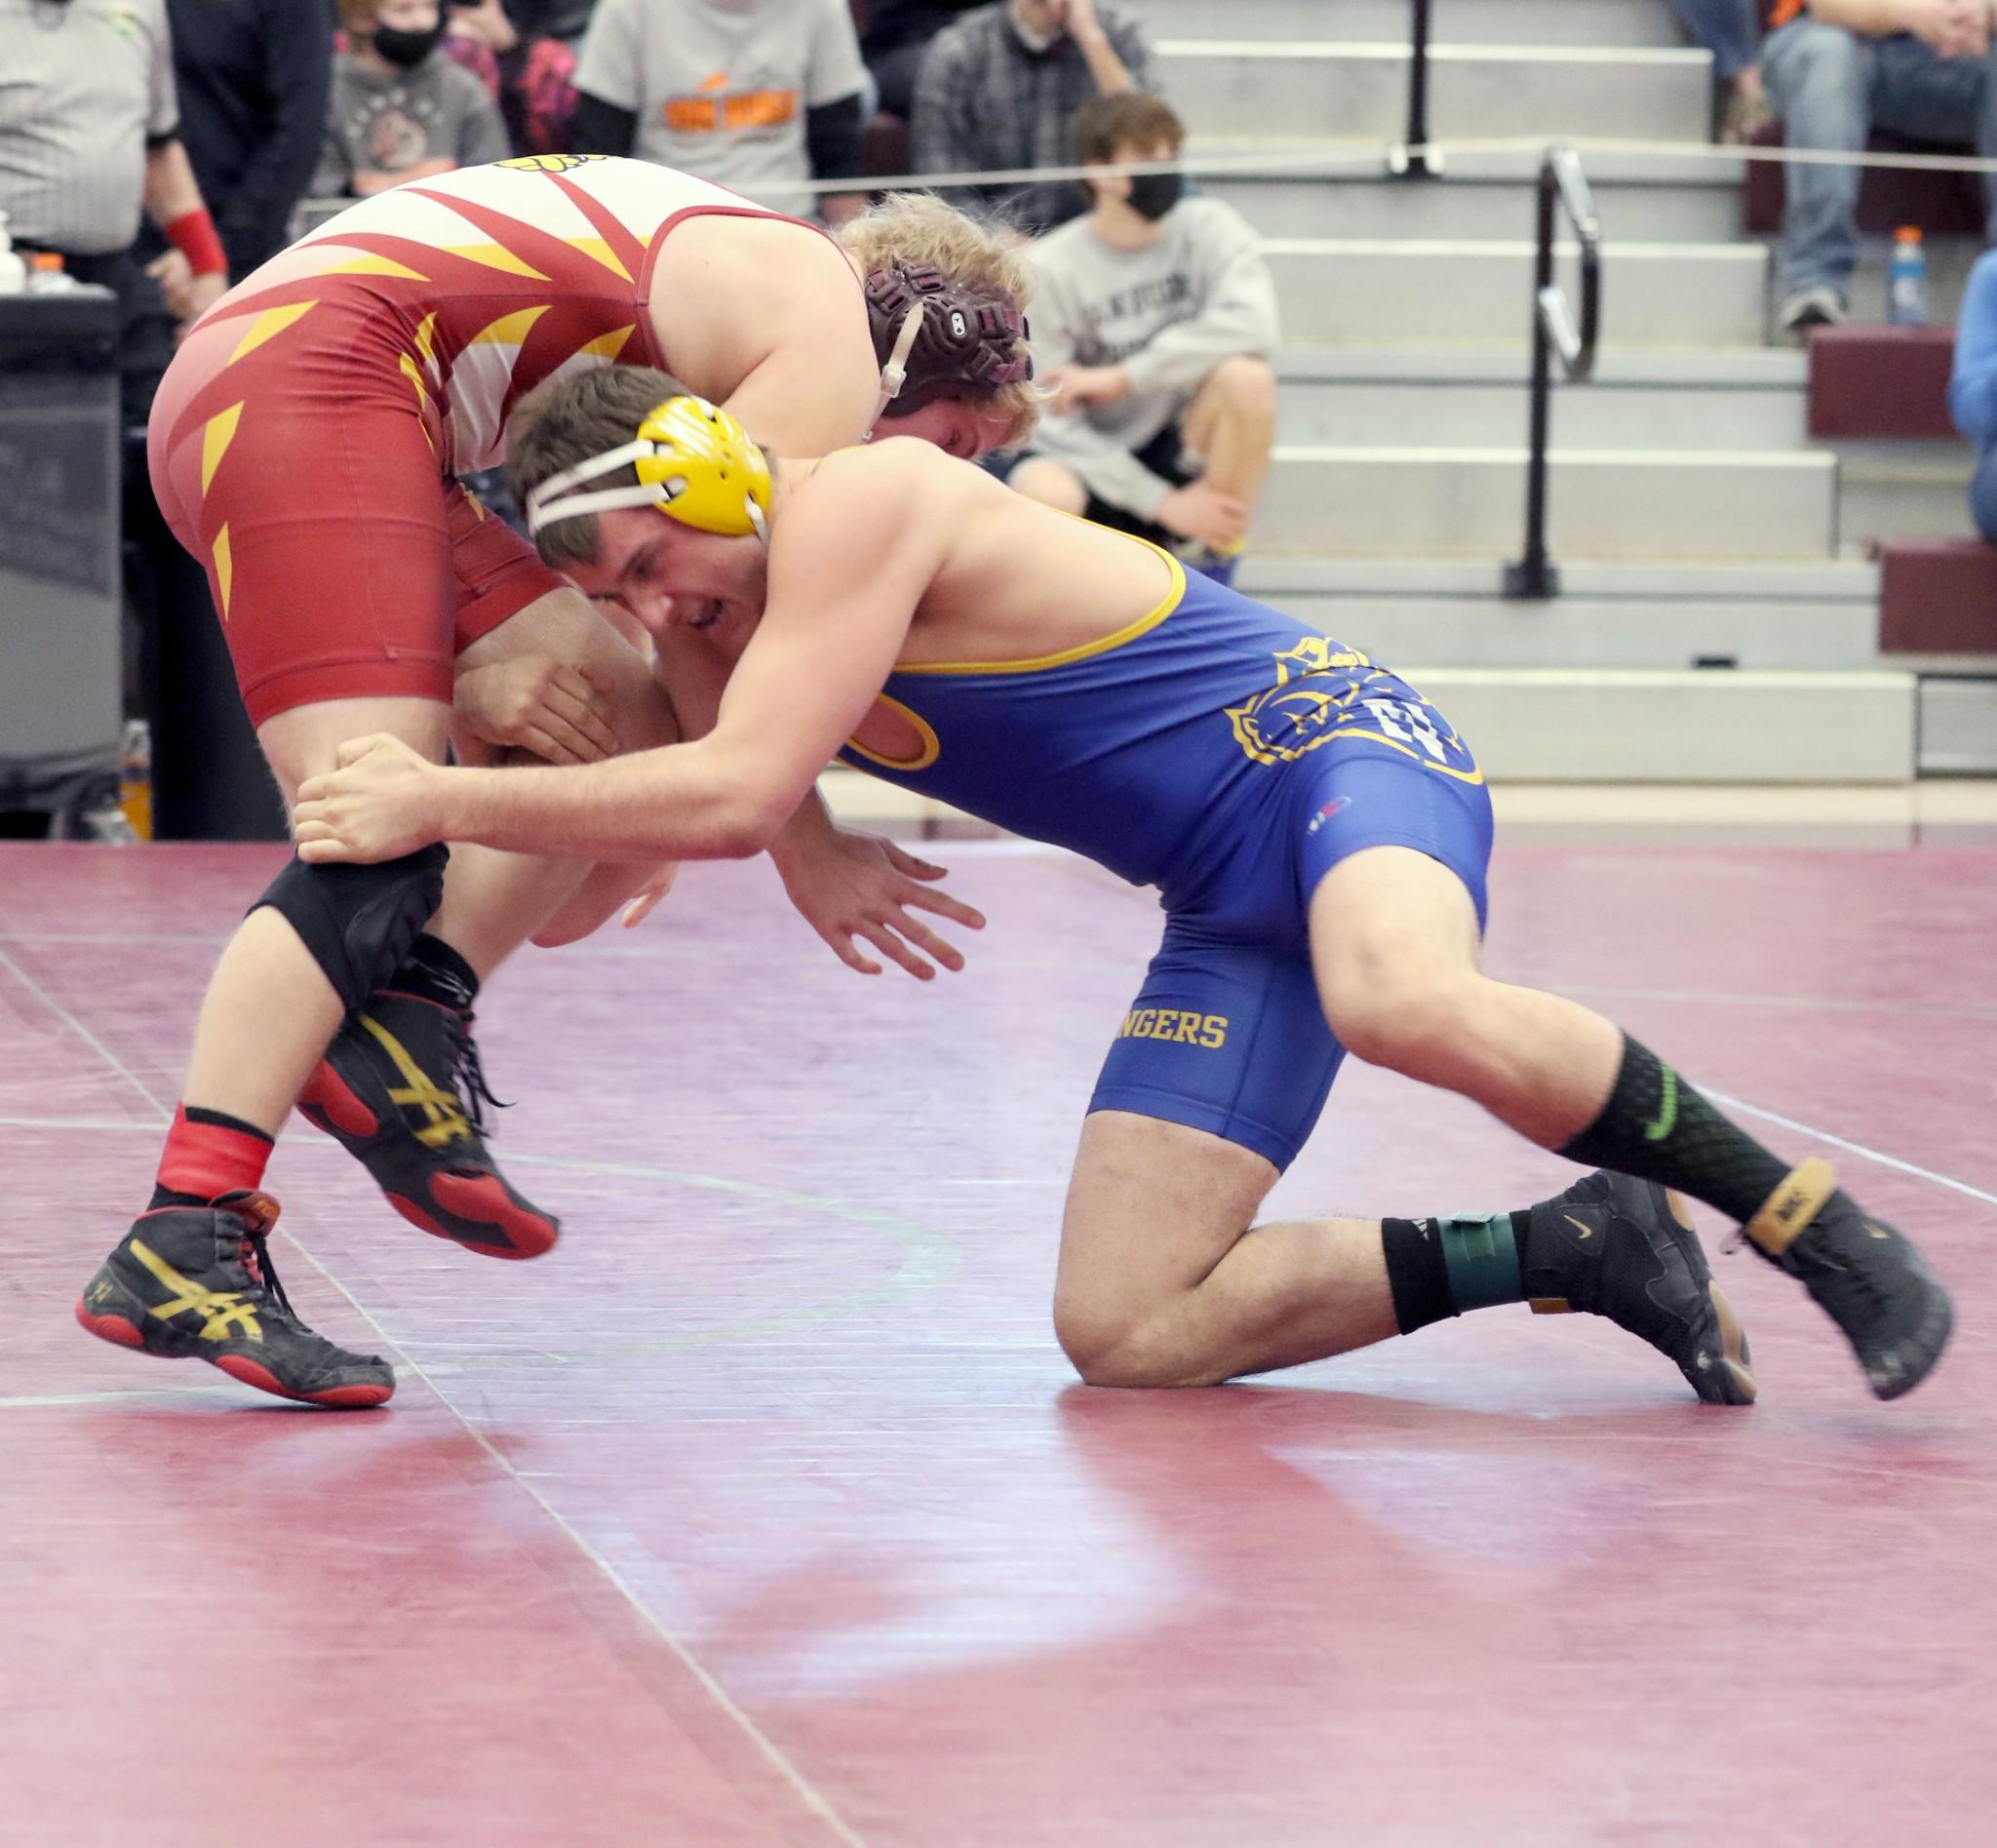 Northwood senior Hunter Schmoekel wrestles Edgerton's Jordan Warner in a 170 pound match. (Photo by Doug Hise)